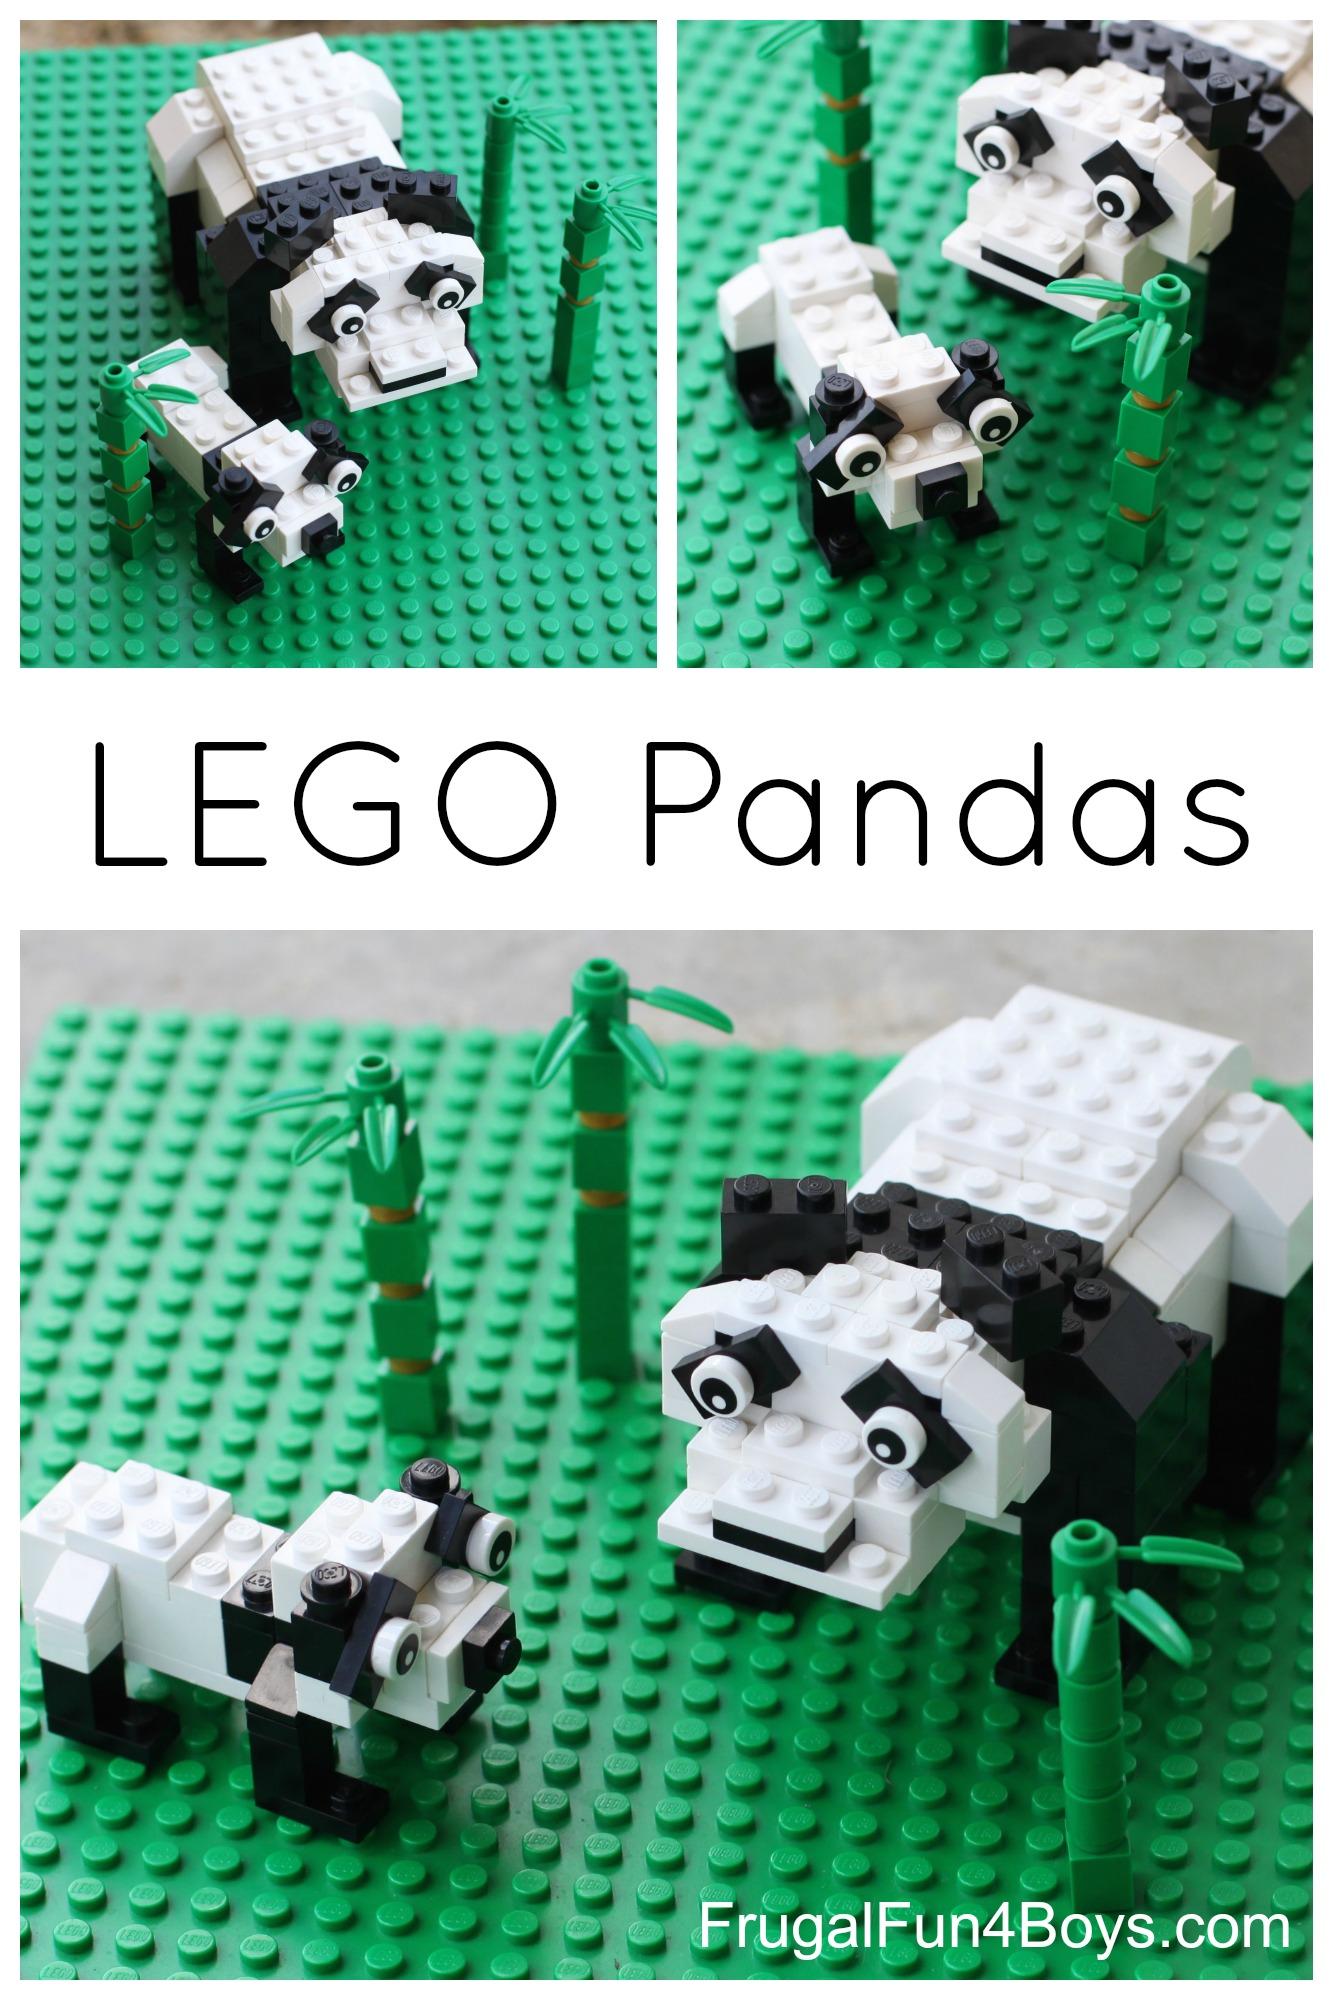 LEGO Pandas Building Instructions